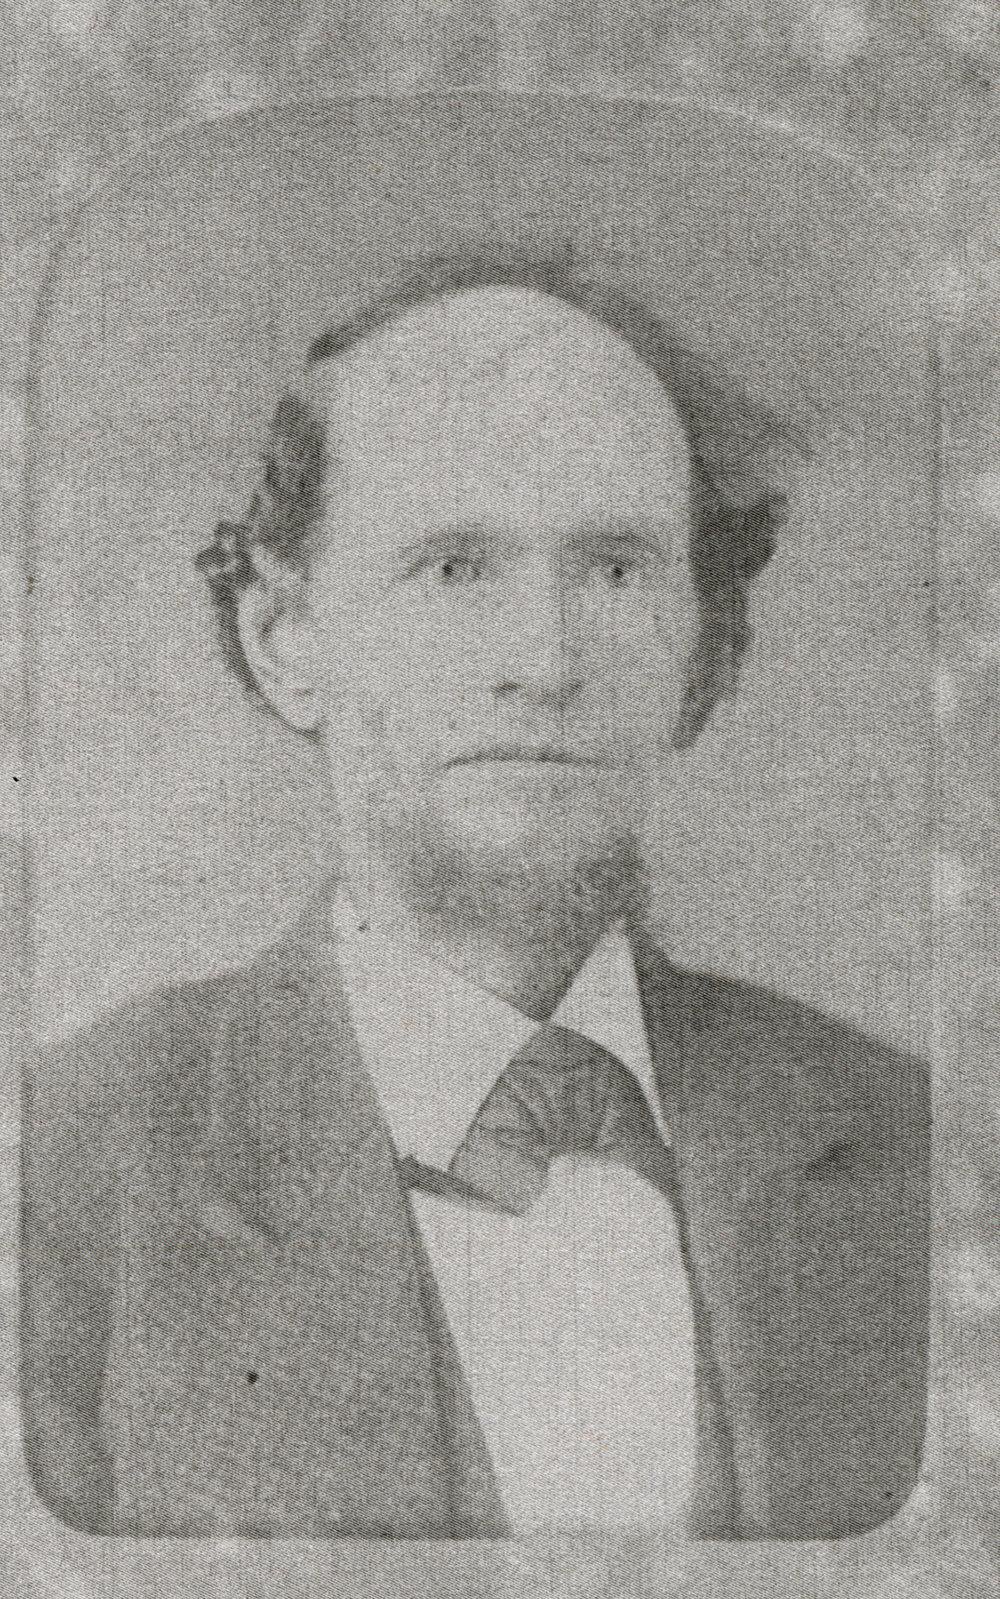 E. A. Chapman, photographer, Lowell, MI